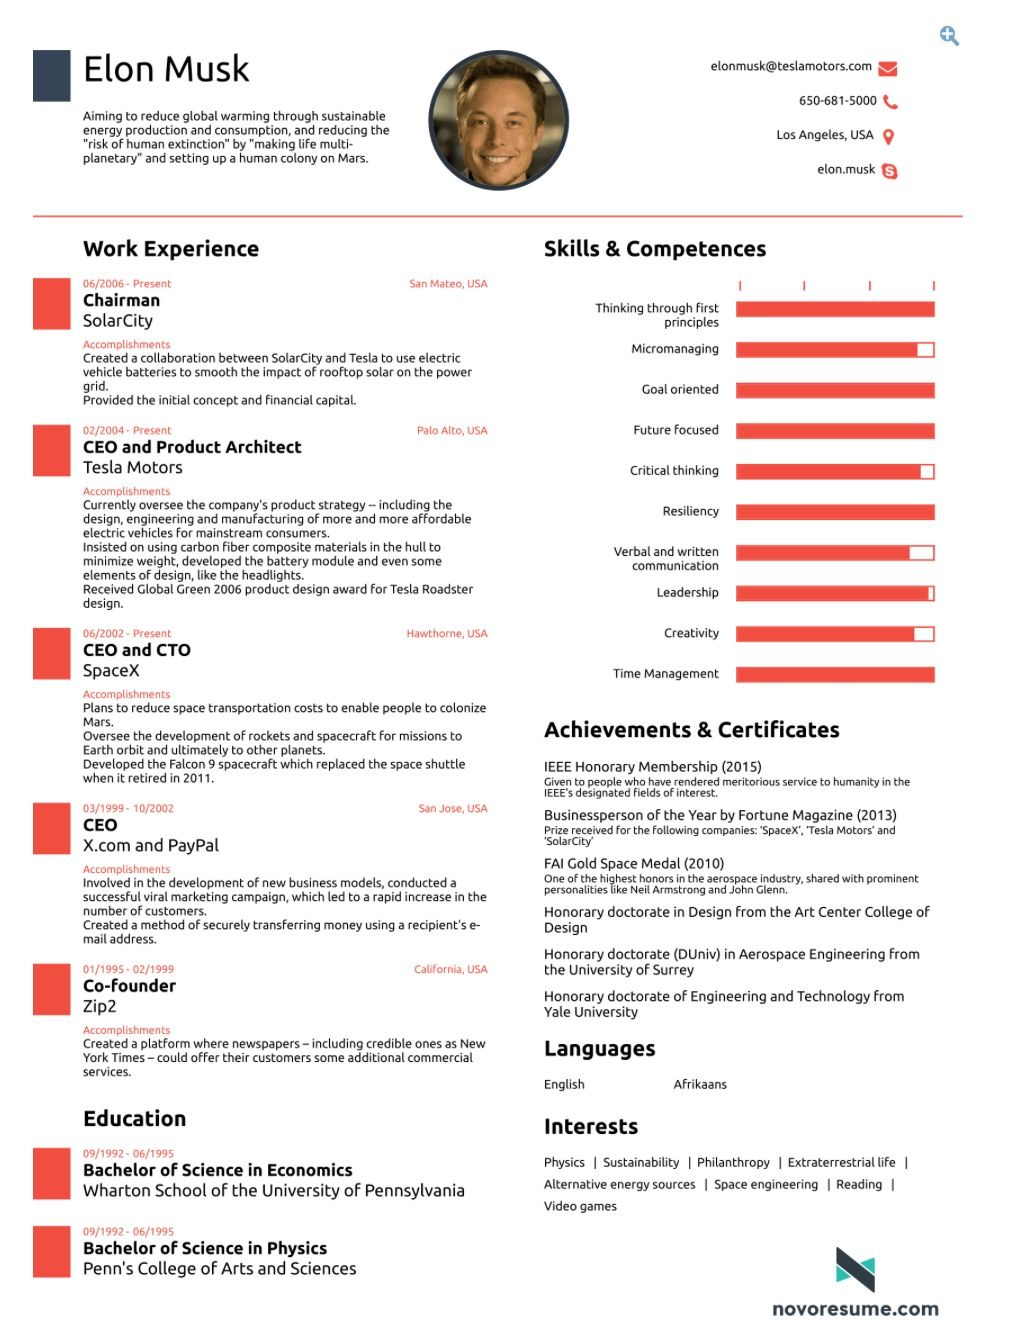 Elon Musk Resume Elon Musk Cv Infographic Resume Visual Resume